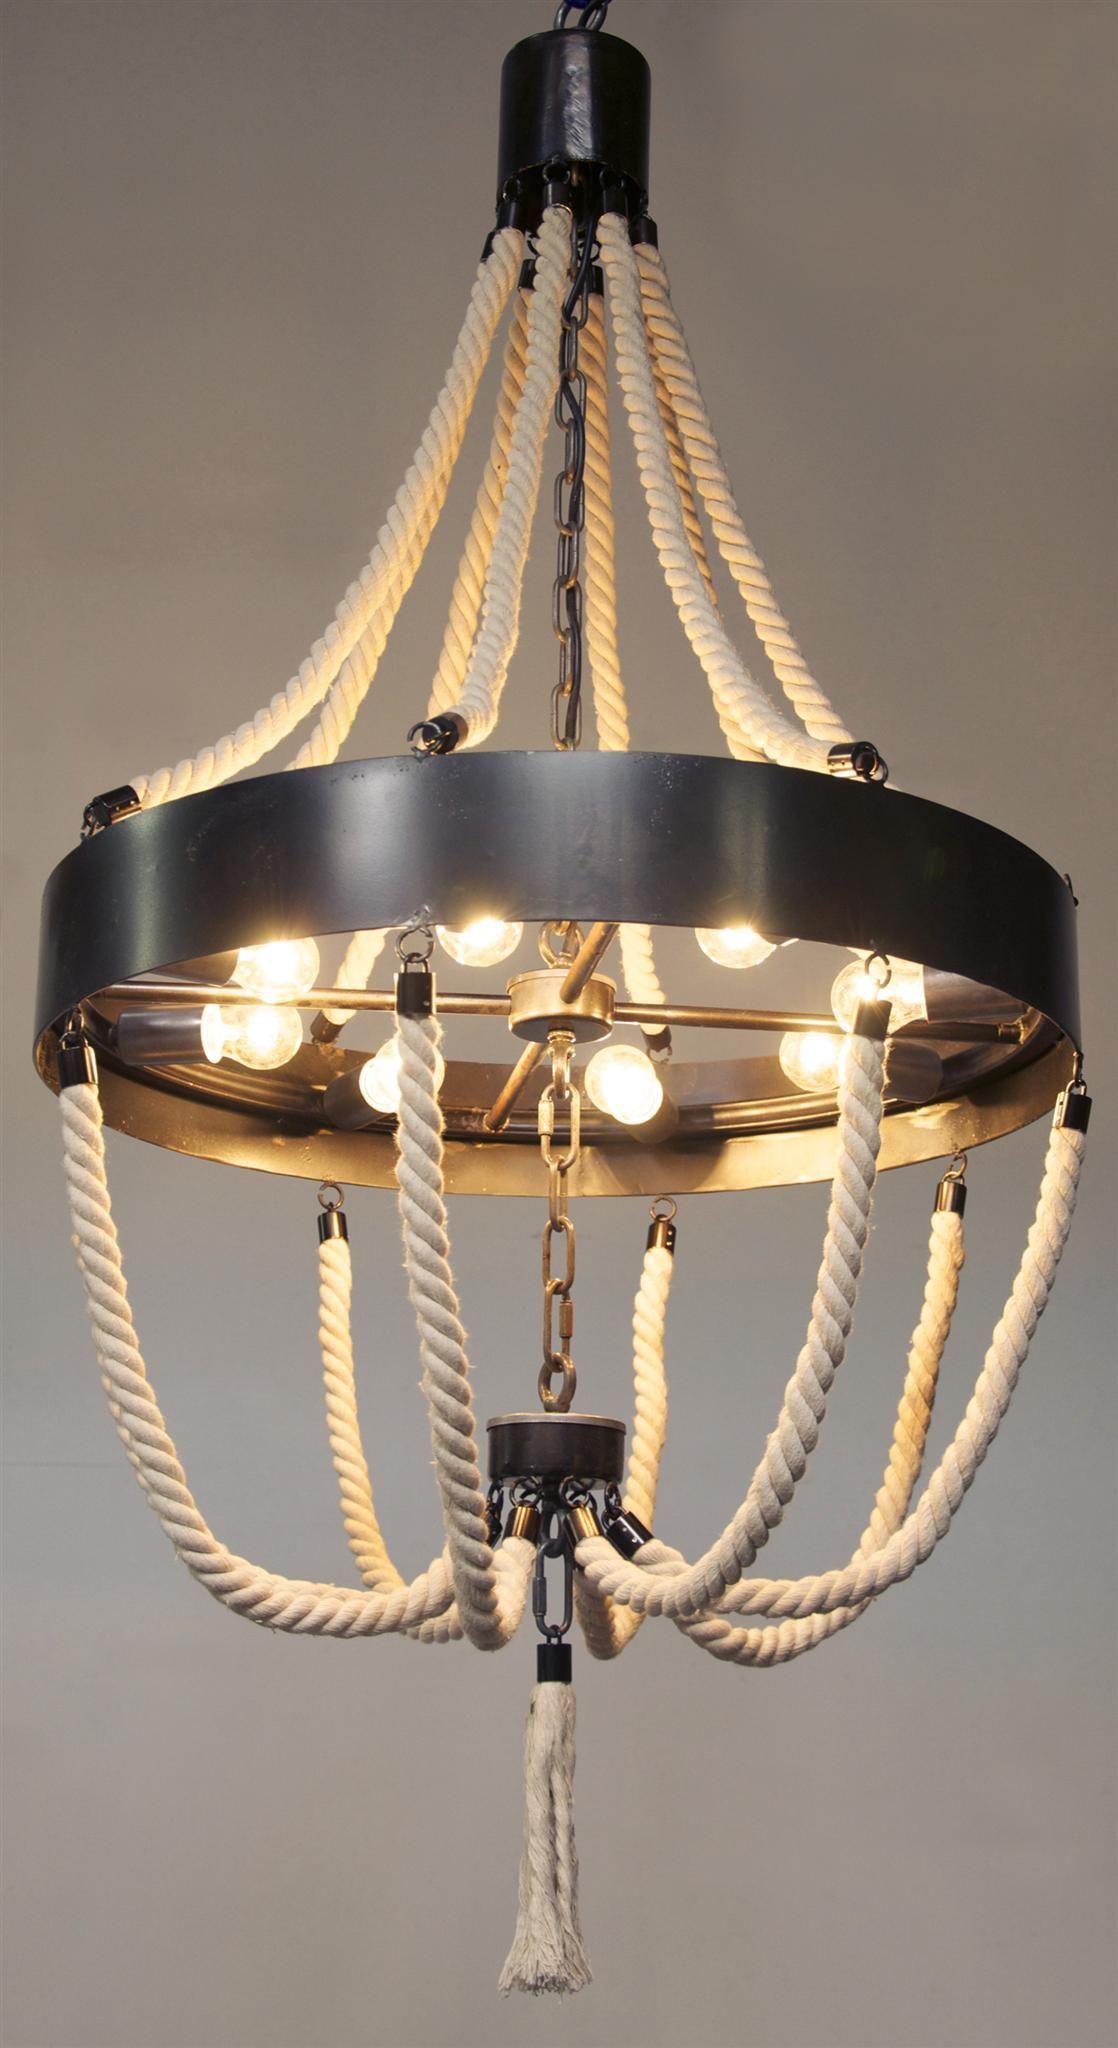 Wagon wheel chandeliers google search wagon wheel chandeliers wagon wheel chandeliers google search arubaitofo Image collections